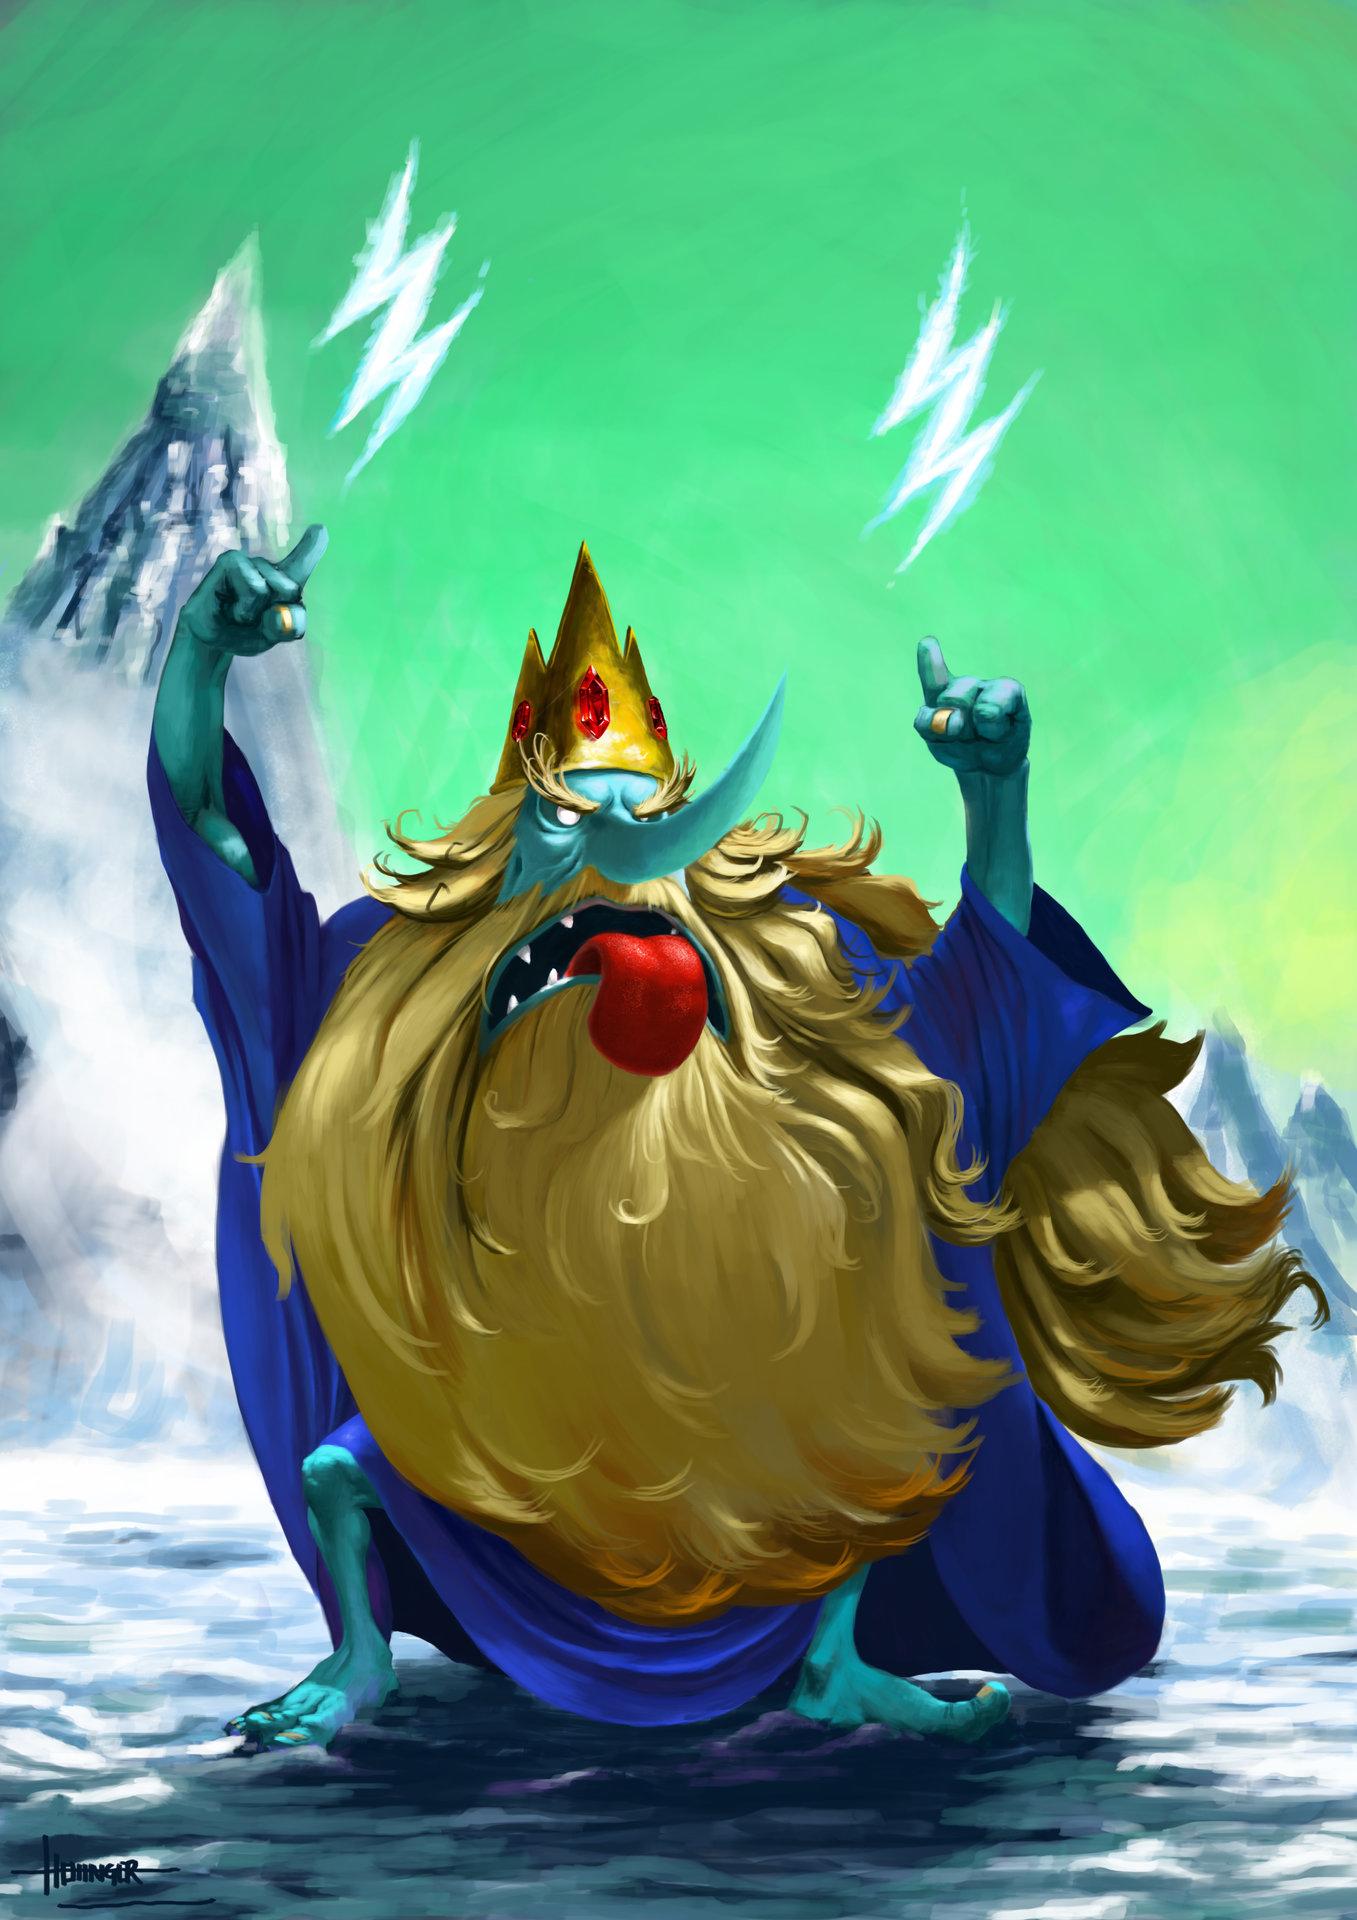 Thiago hellinger ice king final